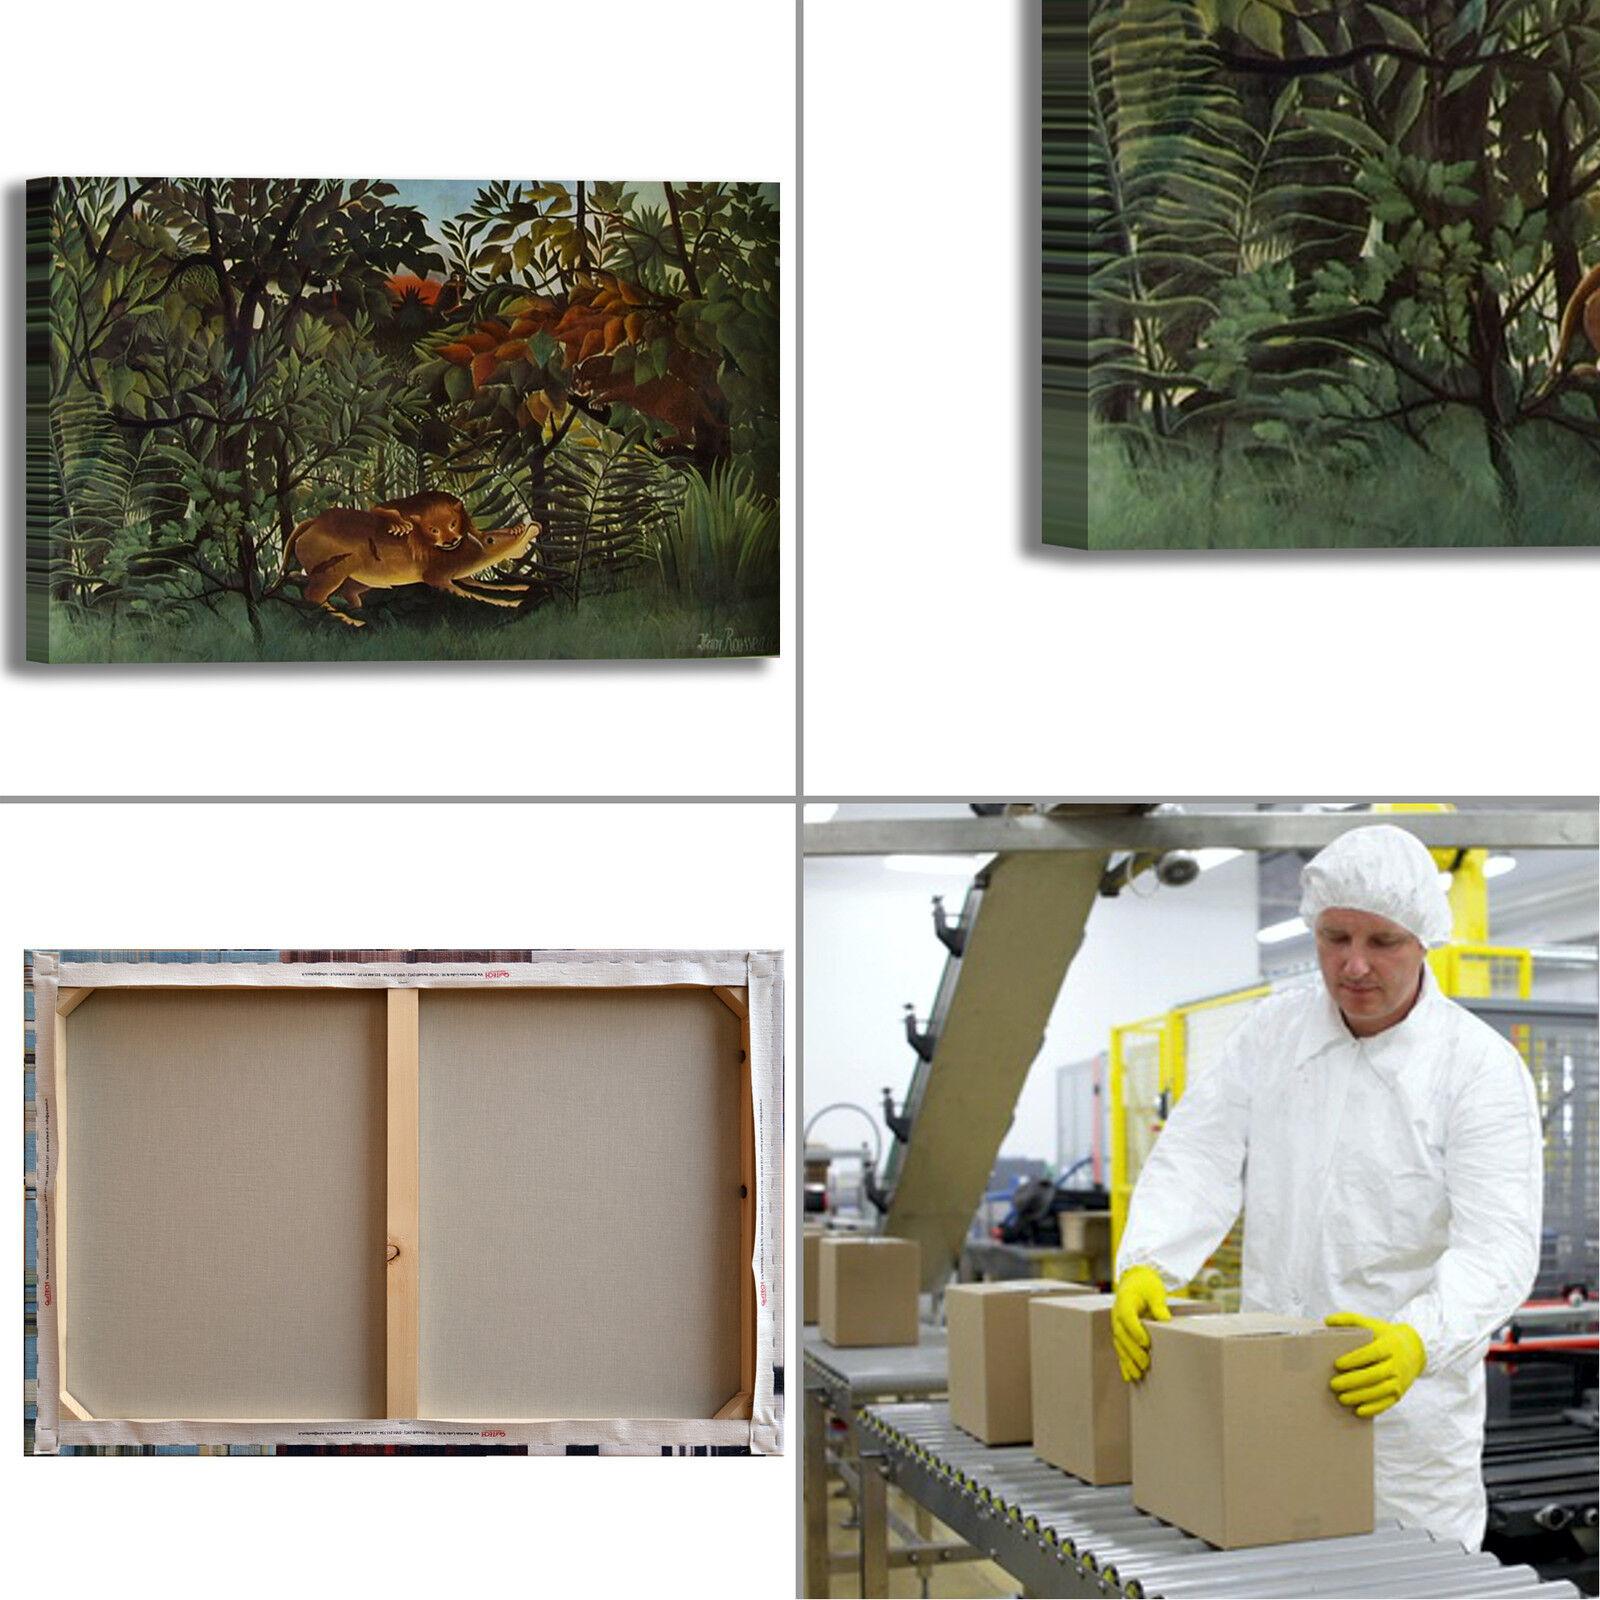 Rousseau antilope e leone design quadro o stampa tela dipinto telaio arRouge o quadro casa bfc95c